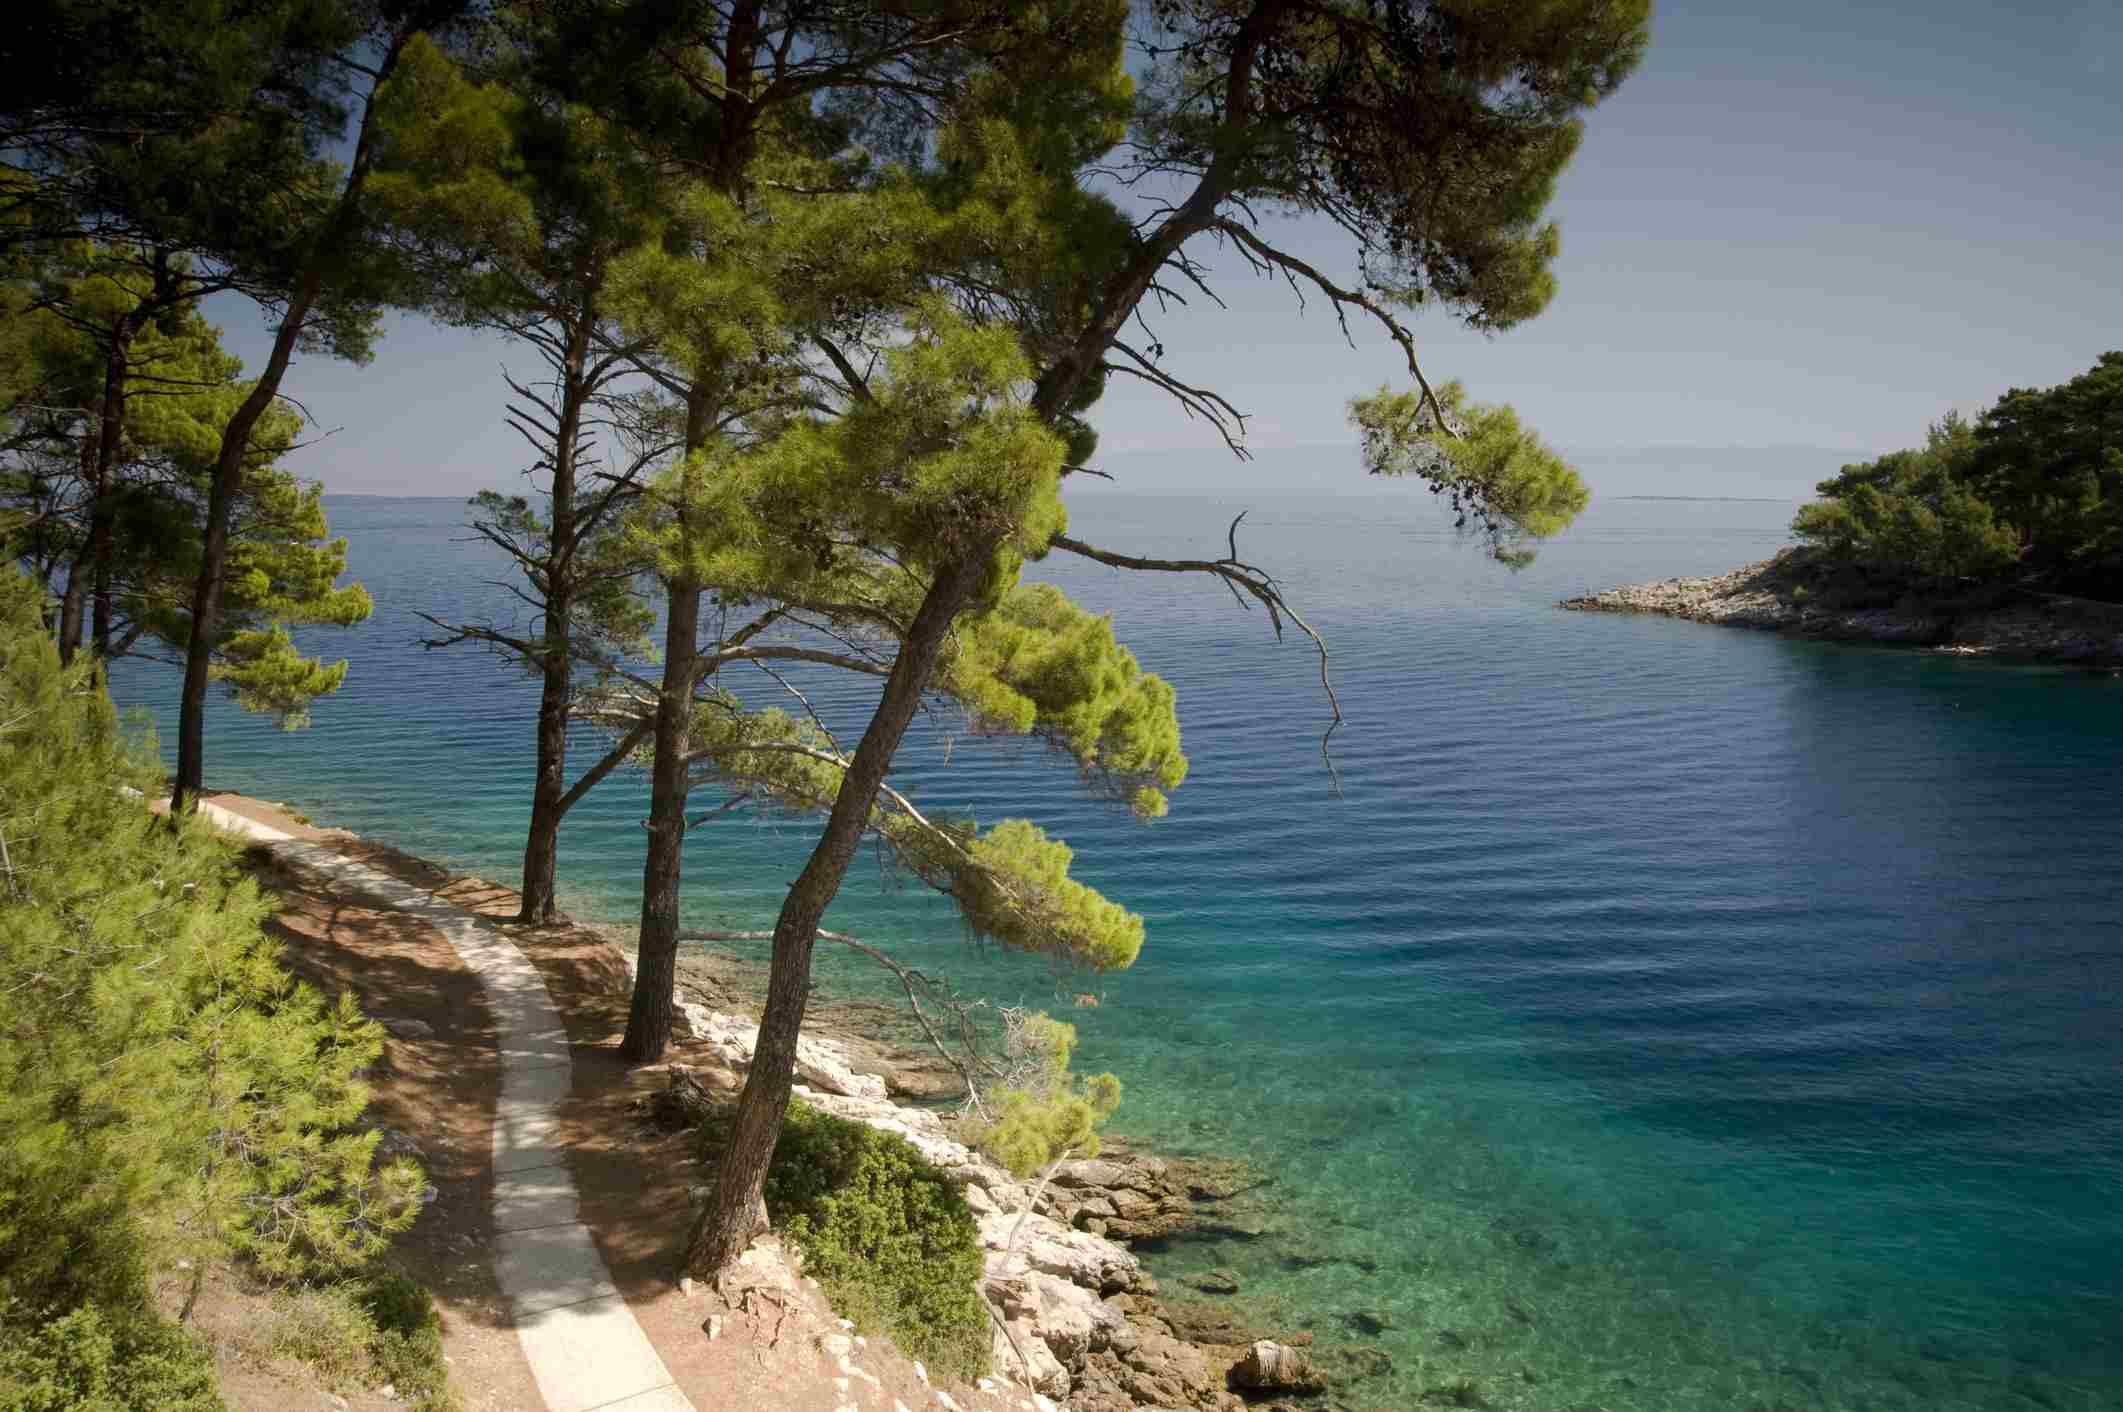 A small bay surrounded by pine trees near Veli Losinj on the island of Losinj, Kvarner region, Croatia, Europe